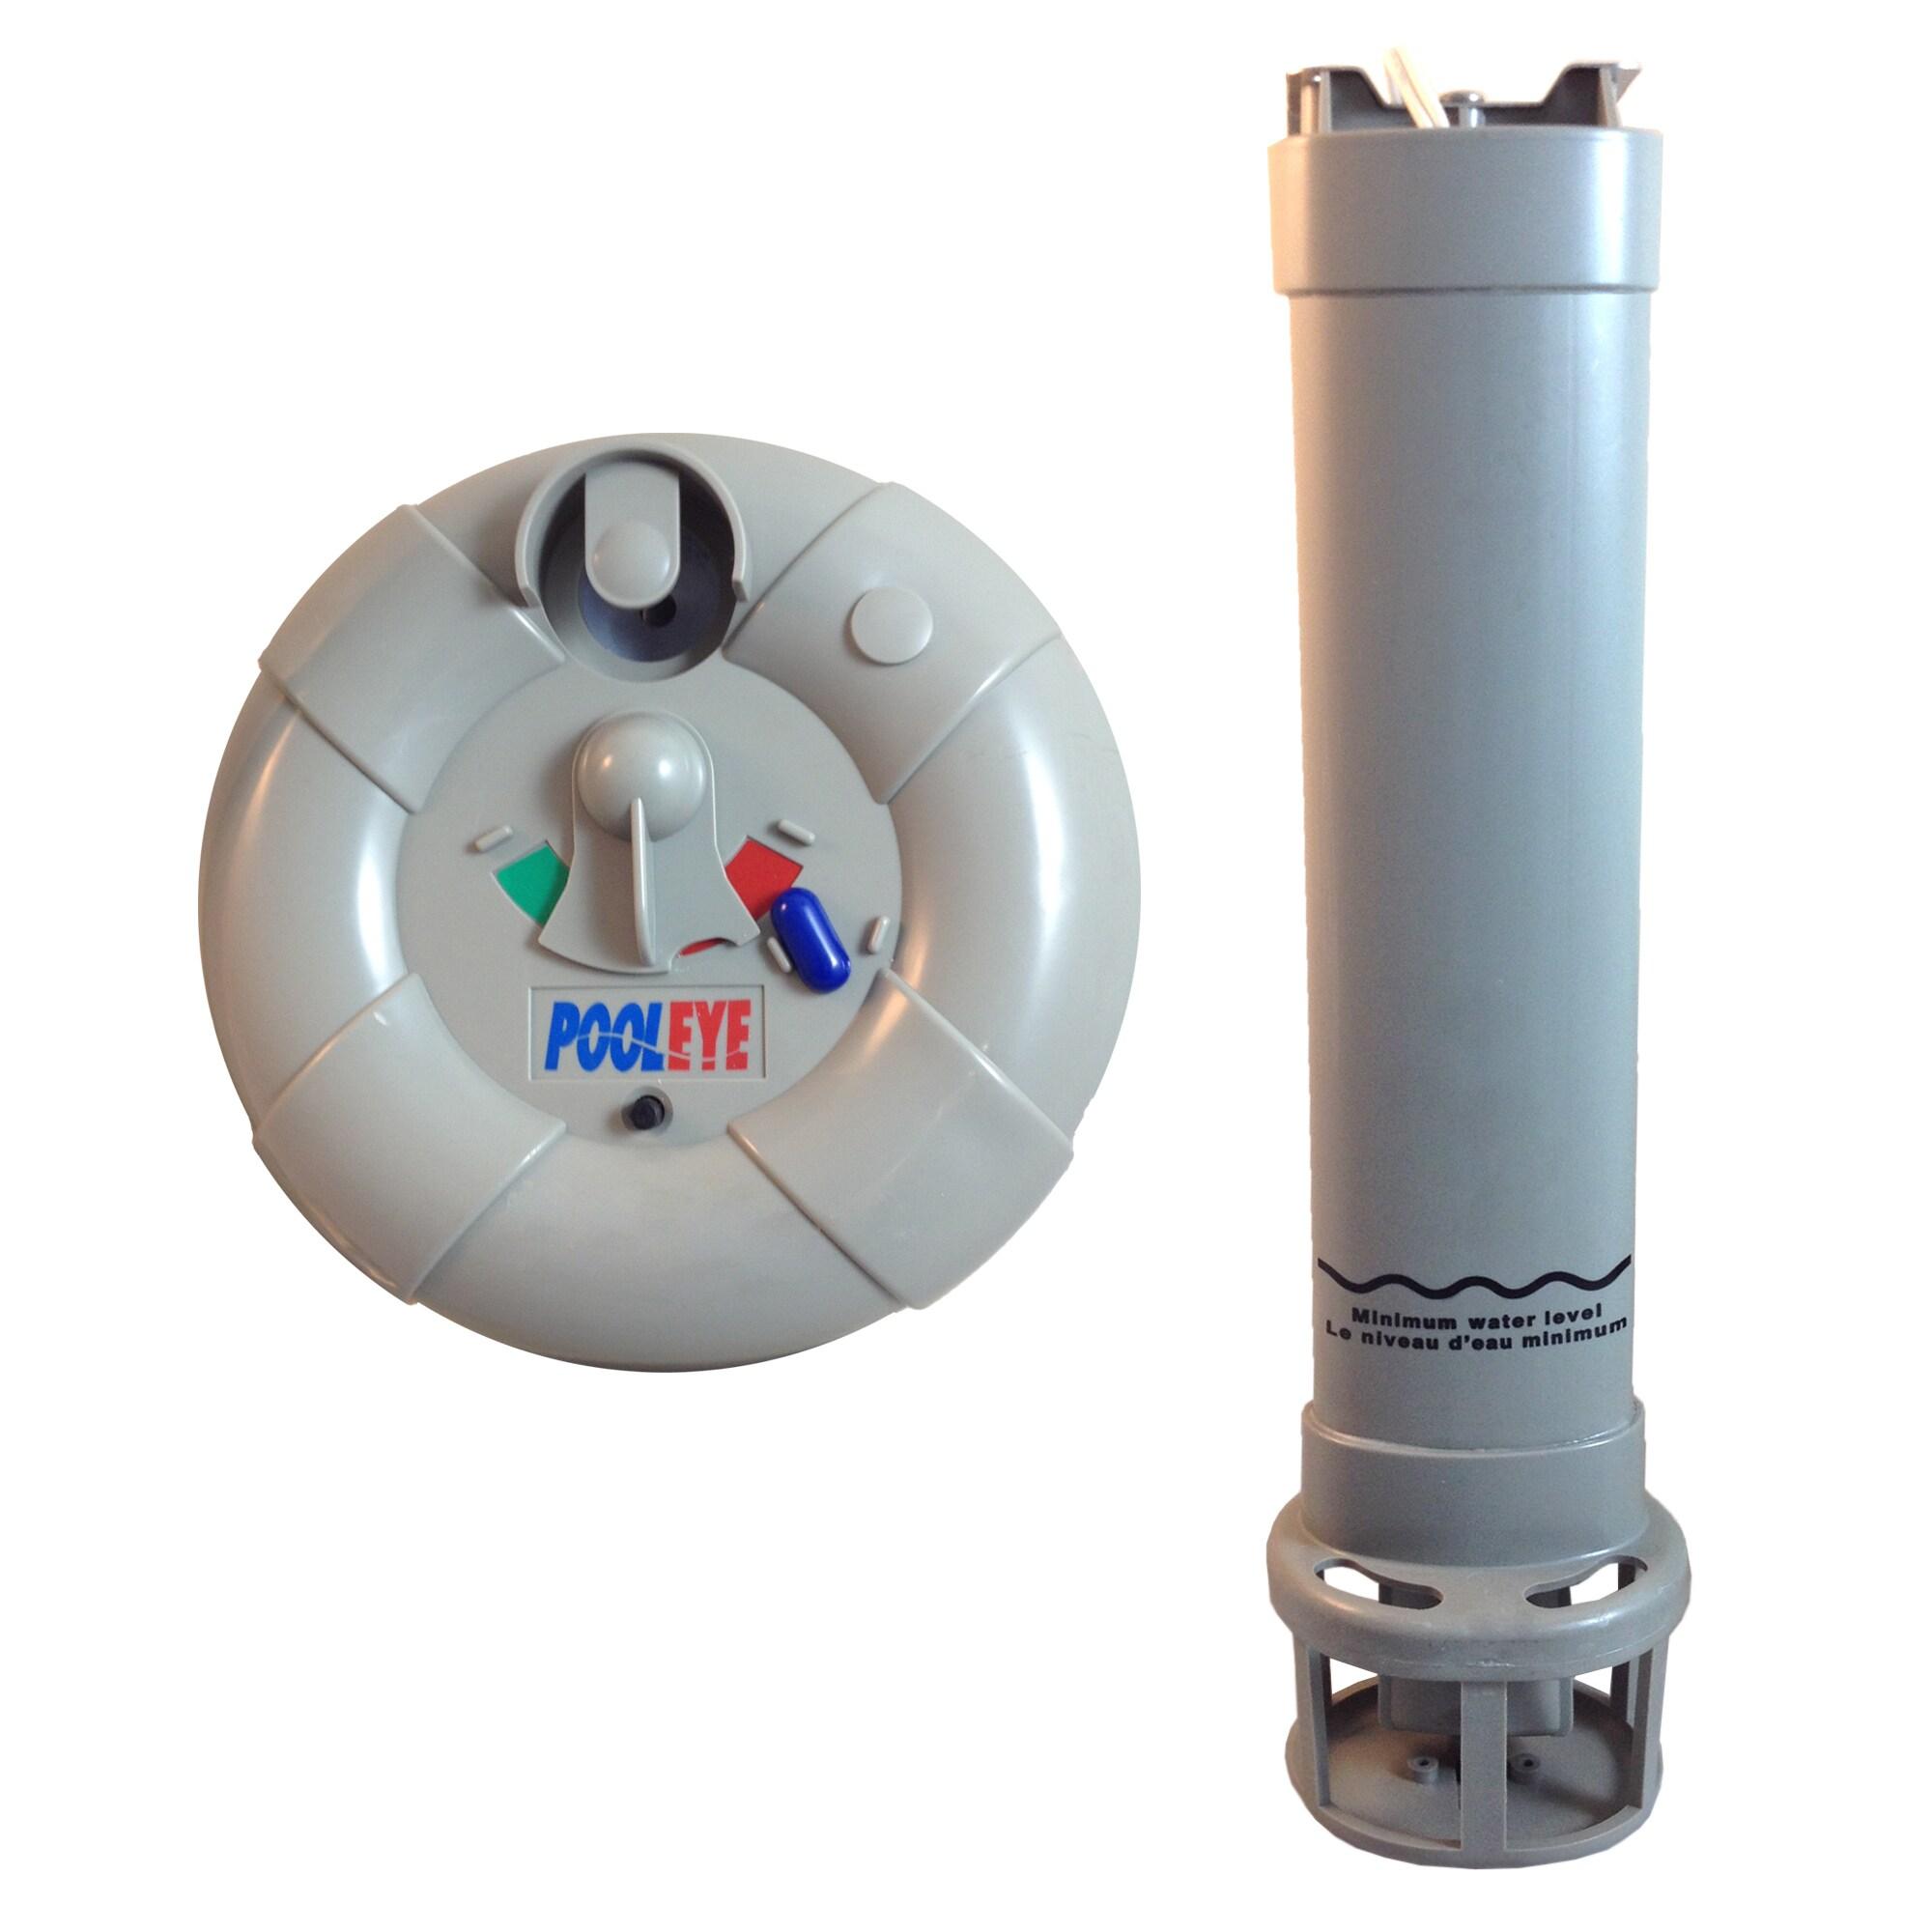 Smartpool PE12 Above Ground Pool Alarm, White (Acrylic)